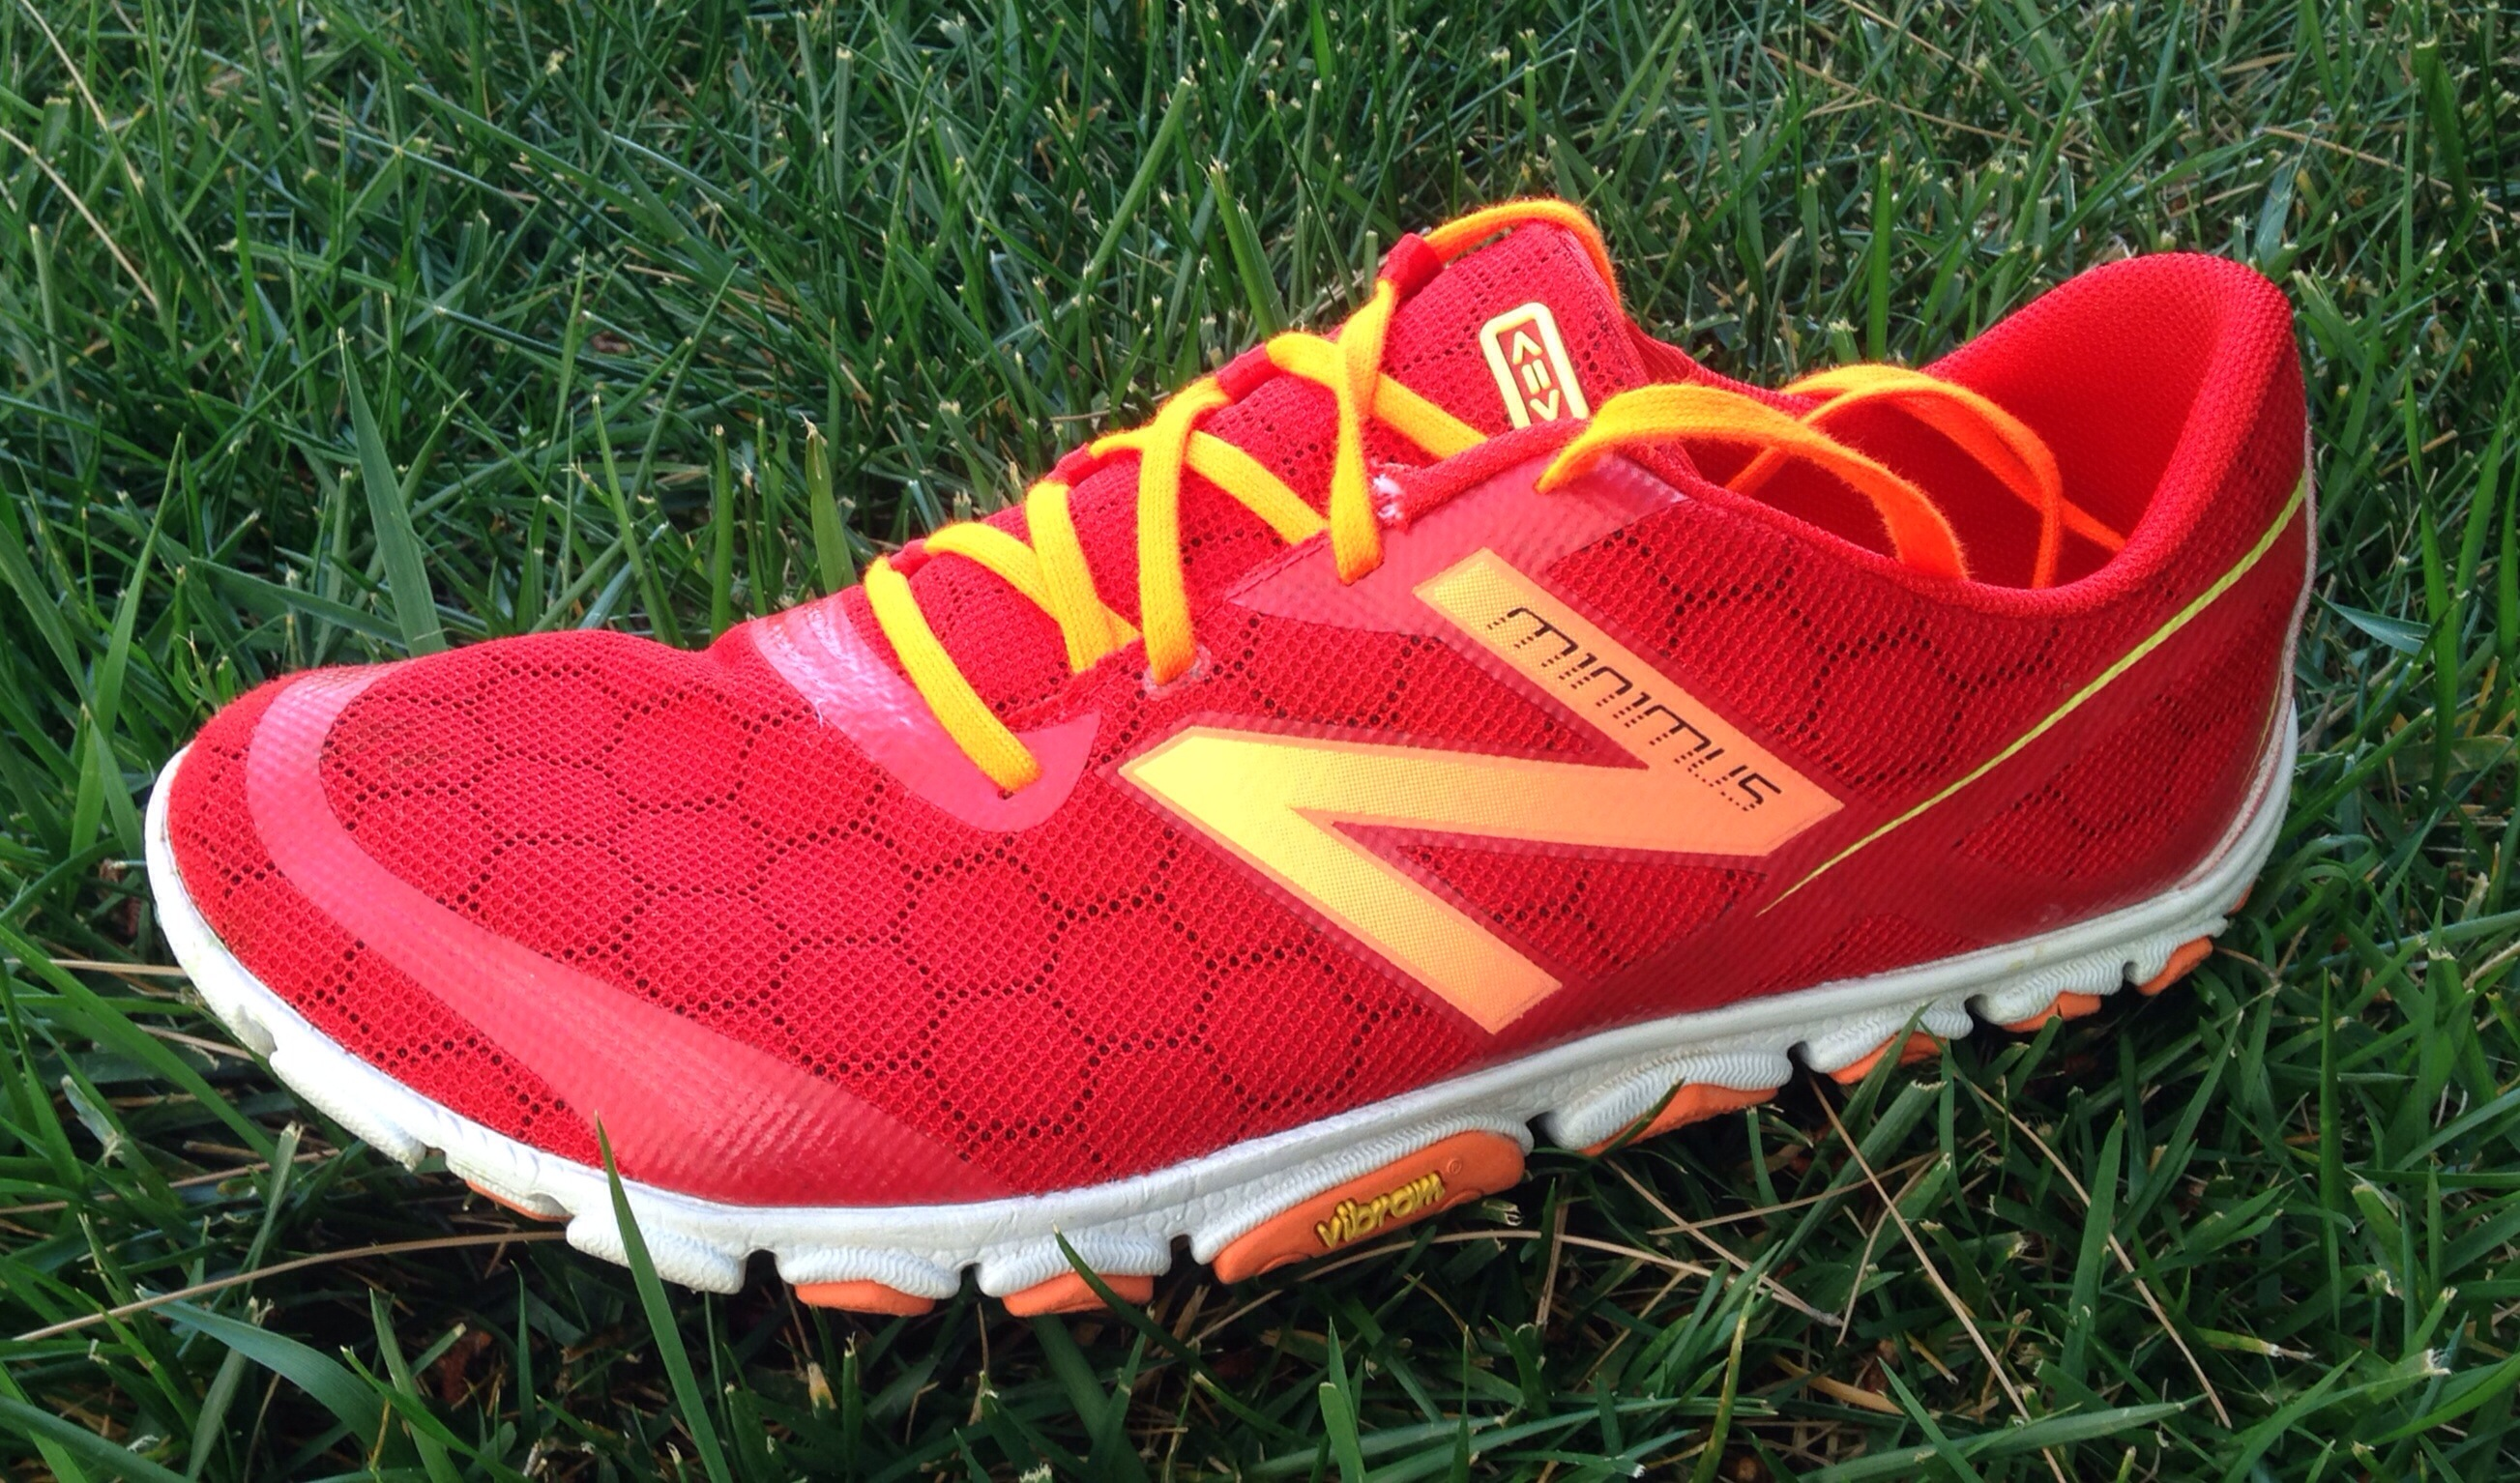 American Ninja Warrior New Balance Shoes